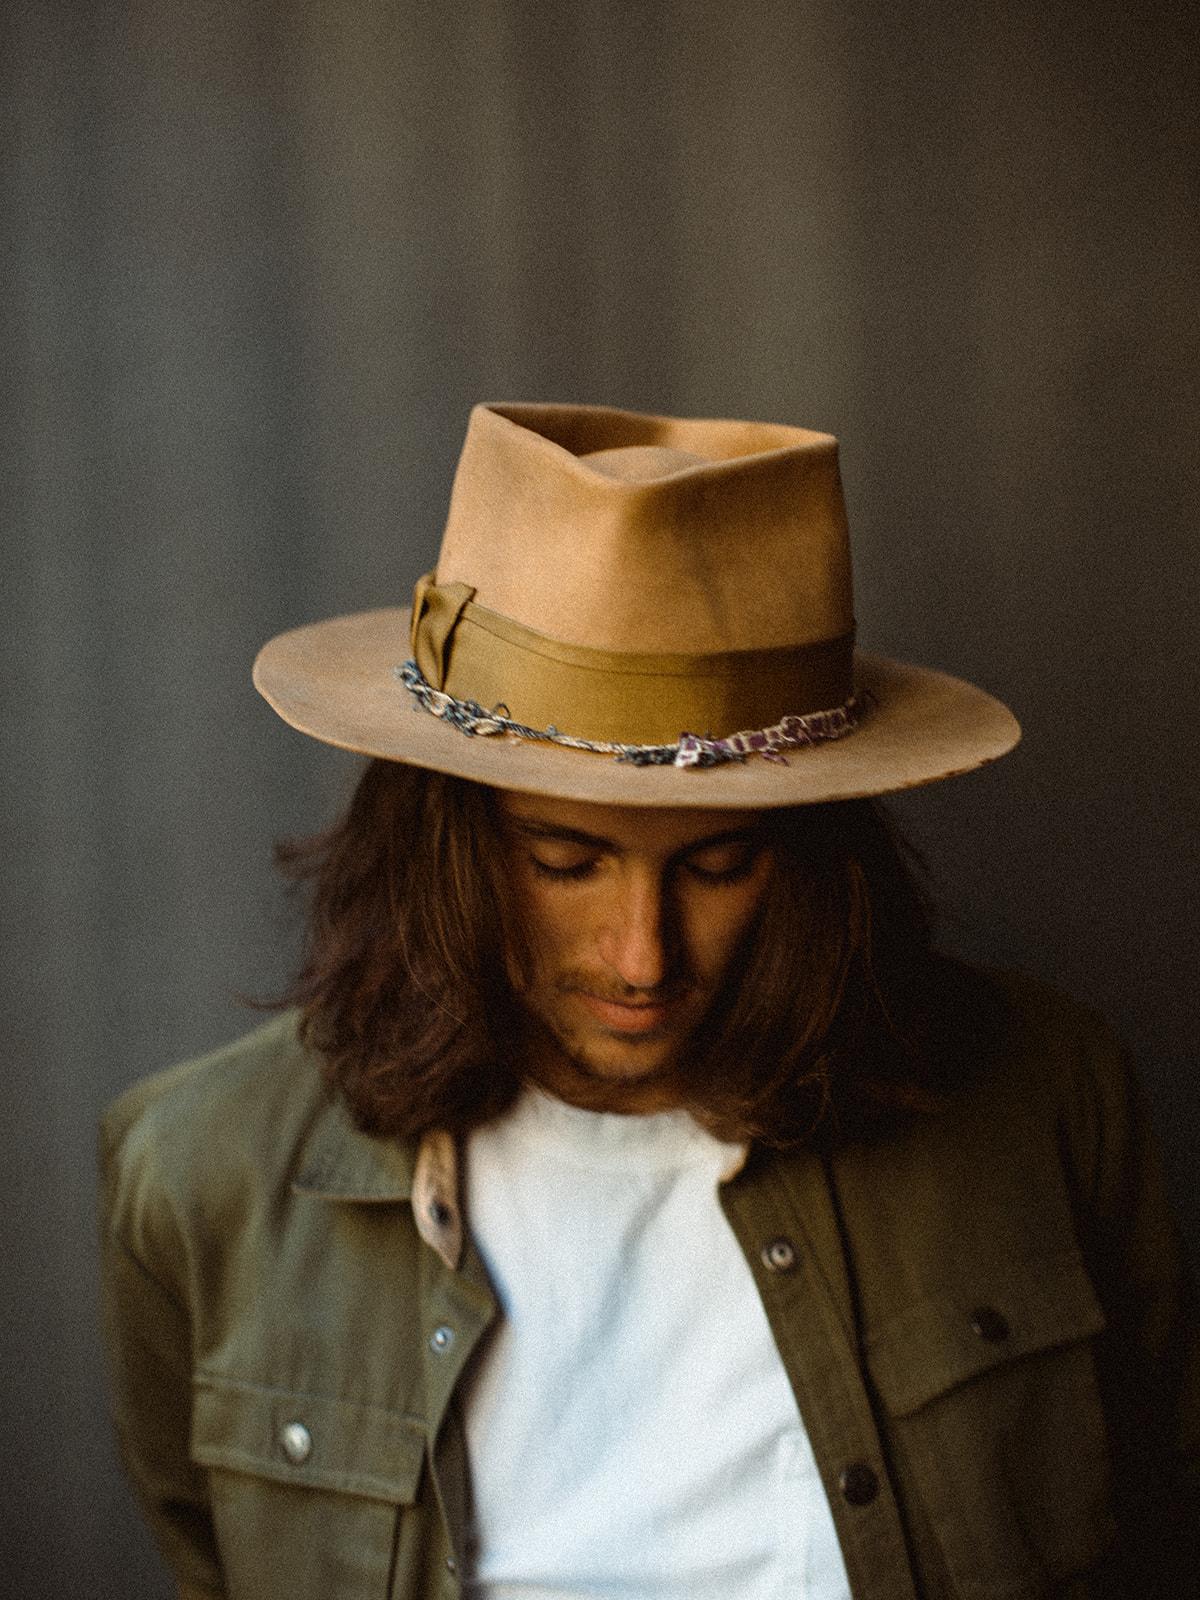 teressa foglia new york city hat designer lookbook-131.jpg